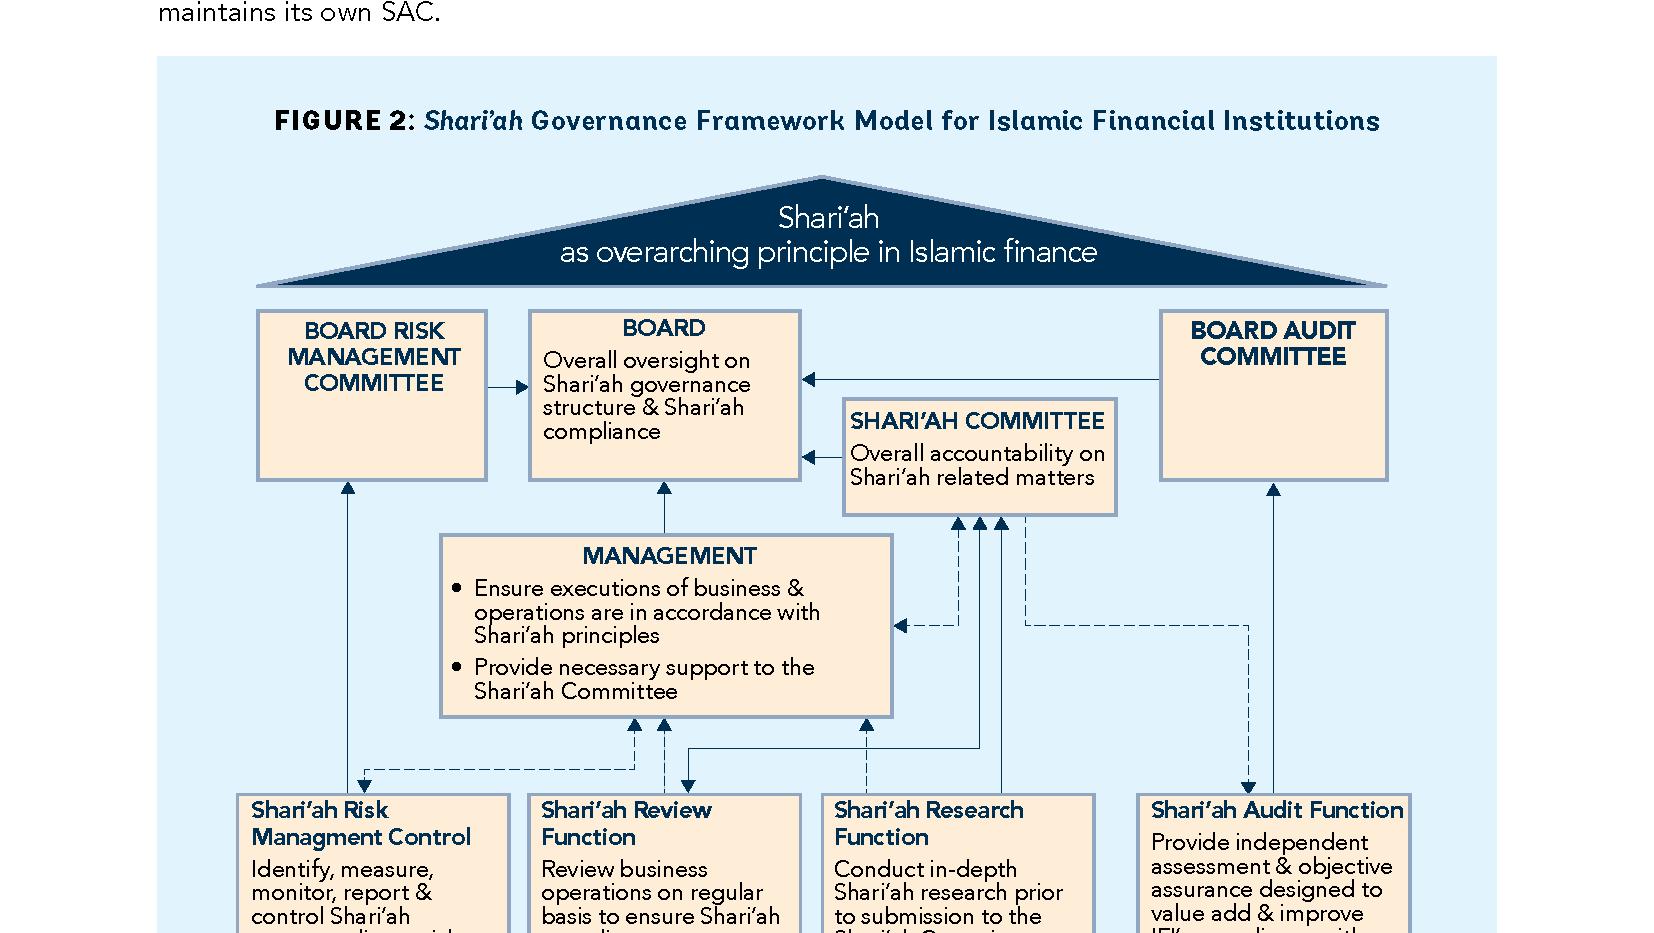 World Bank: Islamic Finance & Financial Inclusiveness (Inside Sample 2)